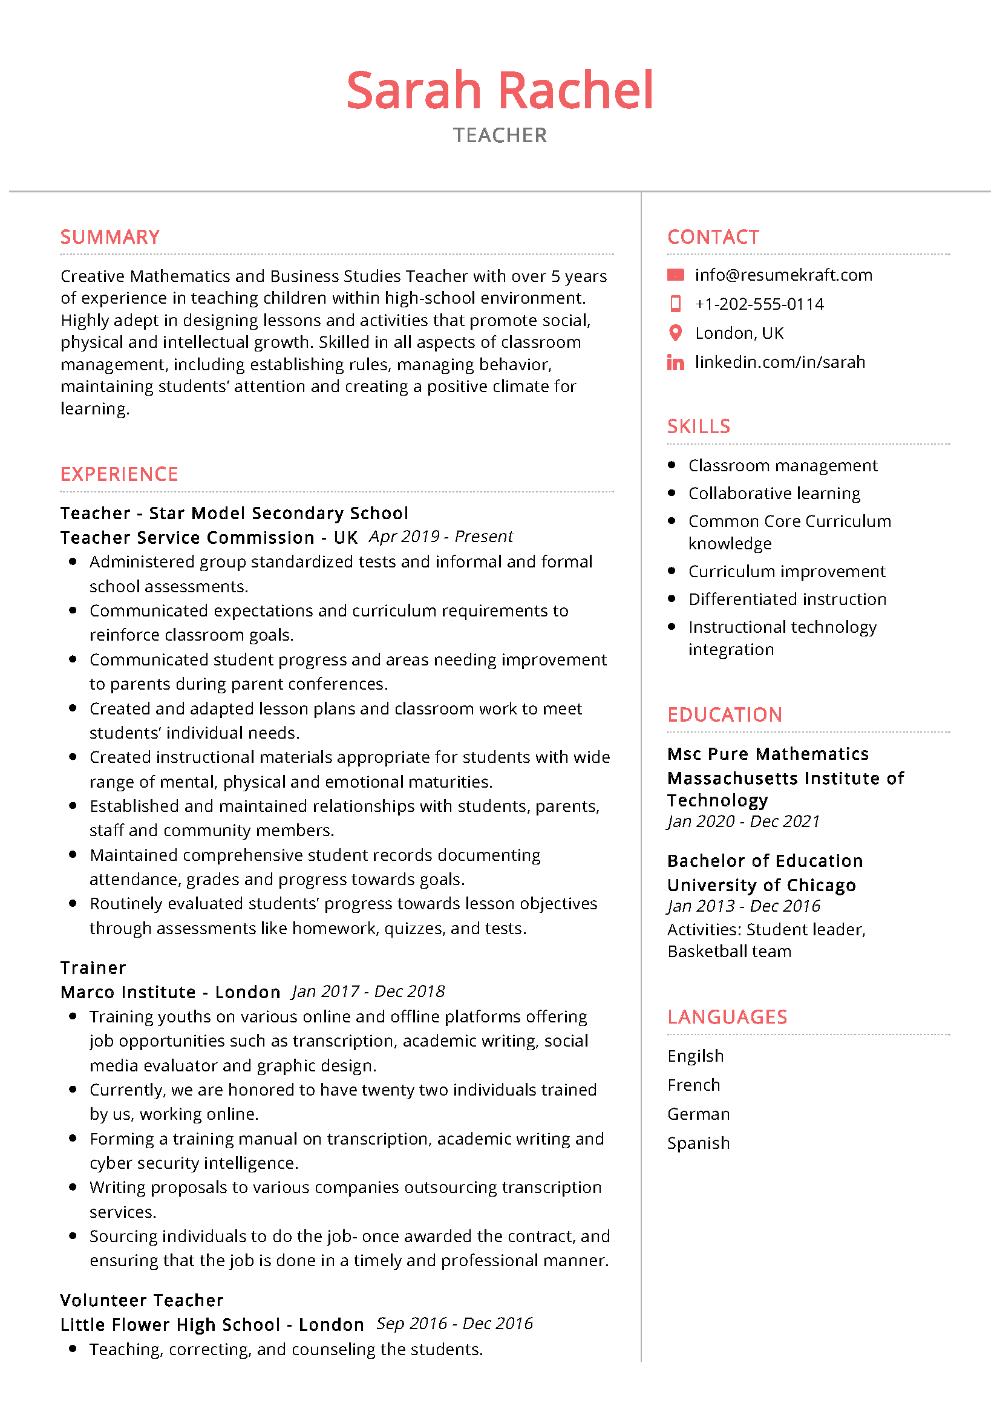 100 Professional Resume Samples For 2020 Resumekraft Teacher Resume Template Teaching Resume Teacher Resume Template Free